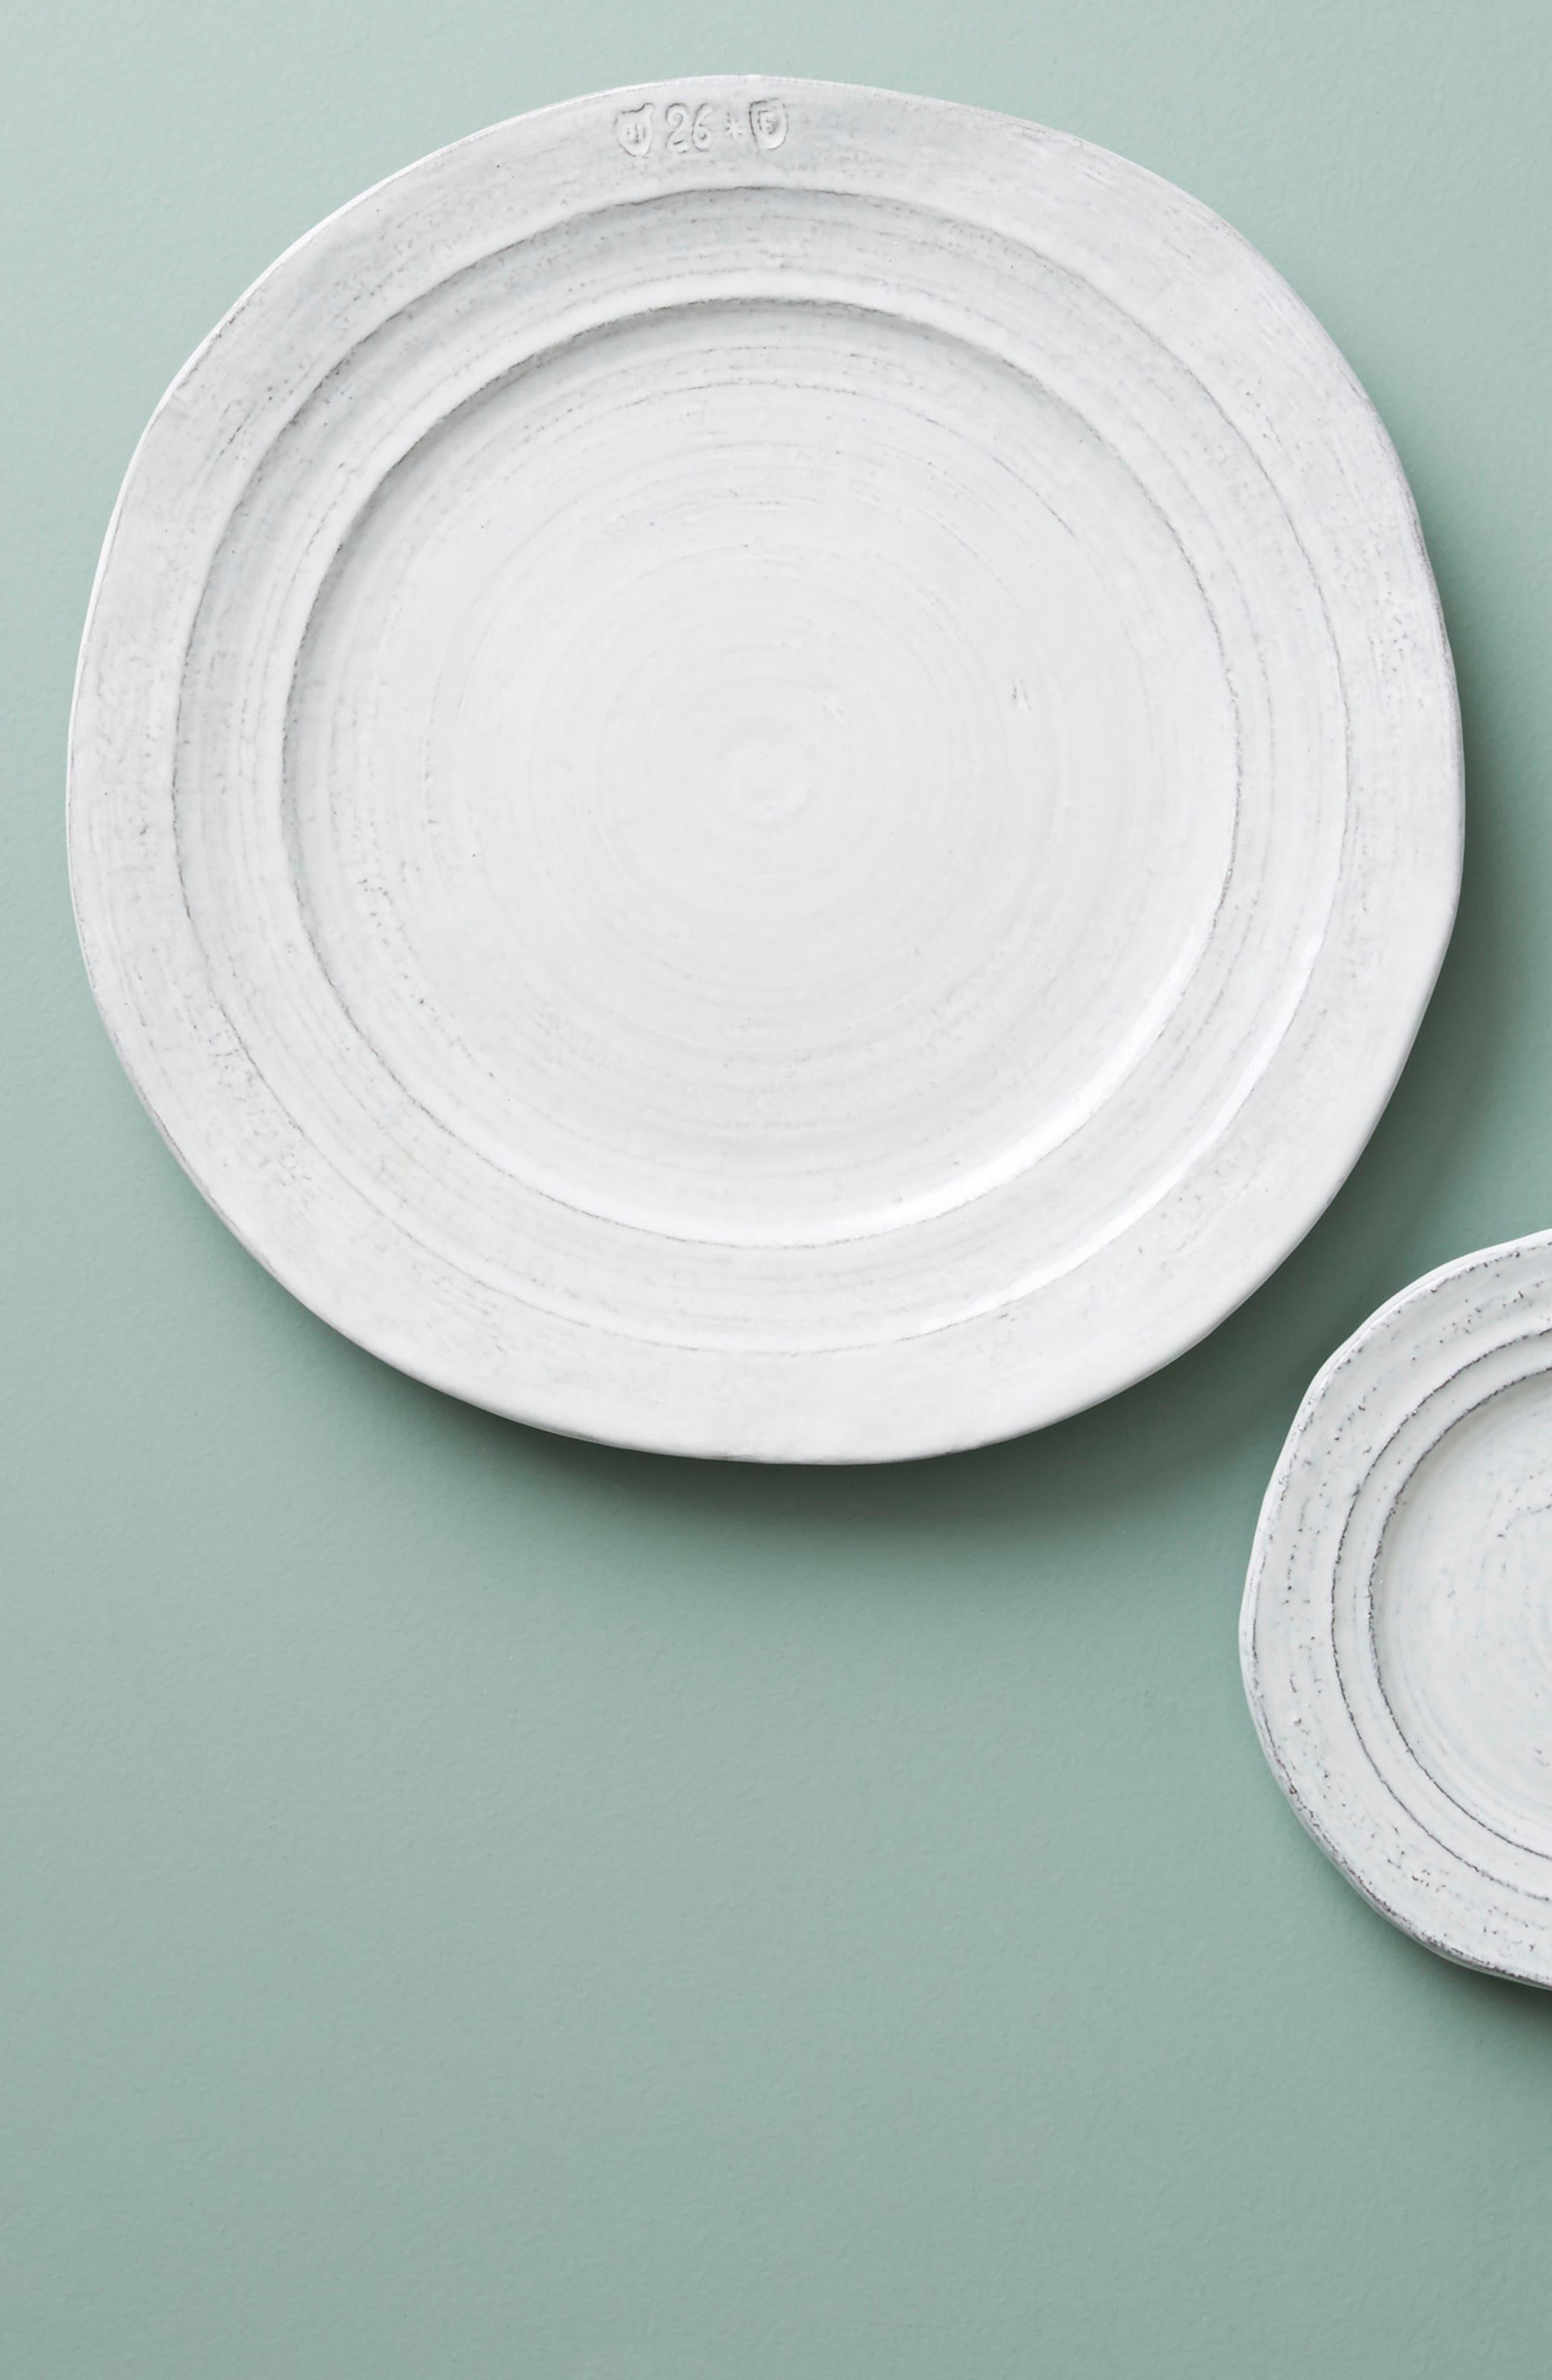 Anthropologie Glenna Dinner Plate & ANTHROPOLOGIE Dinnerware: Dishes Plates u0026 Bowls   Nordstrom